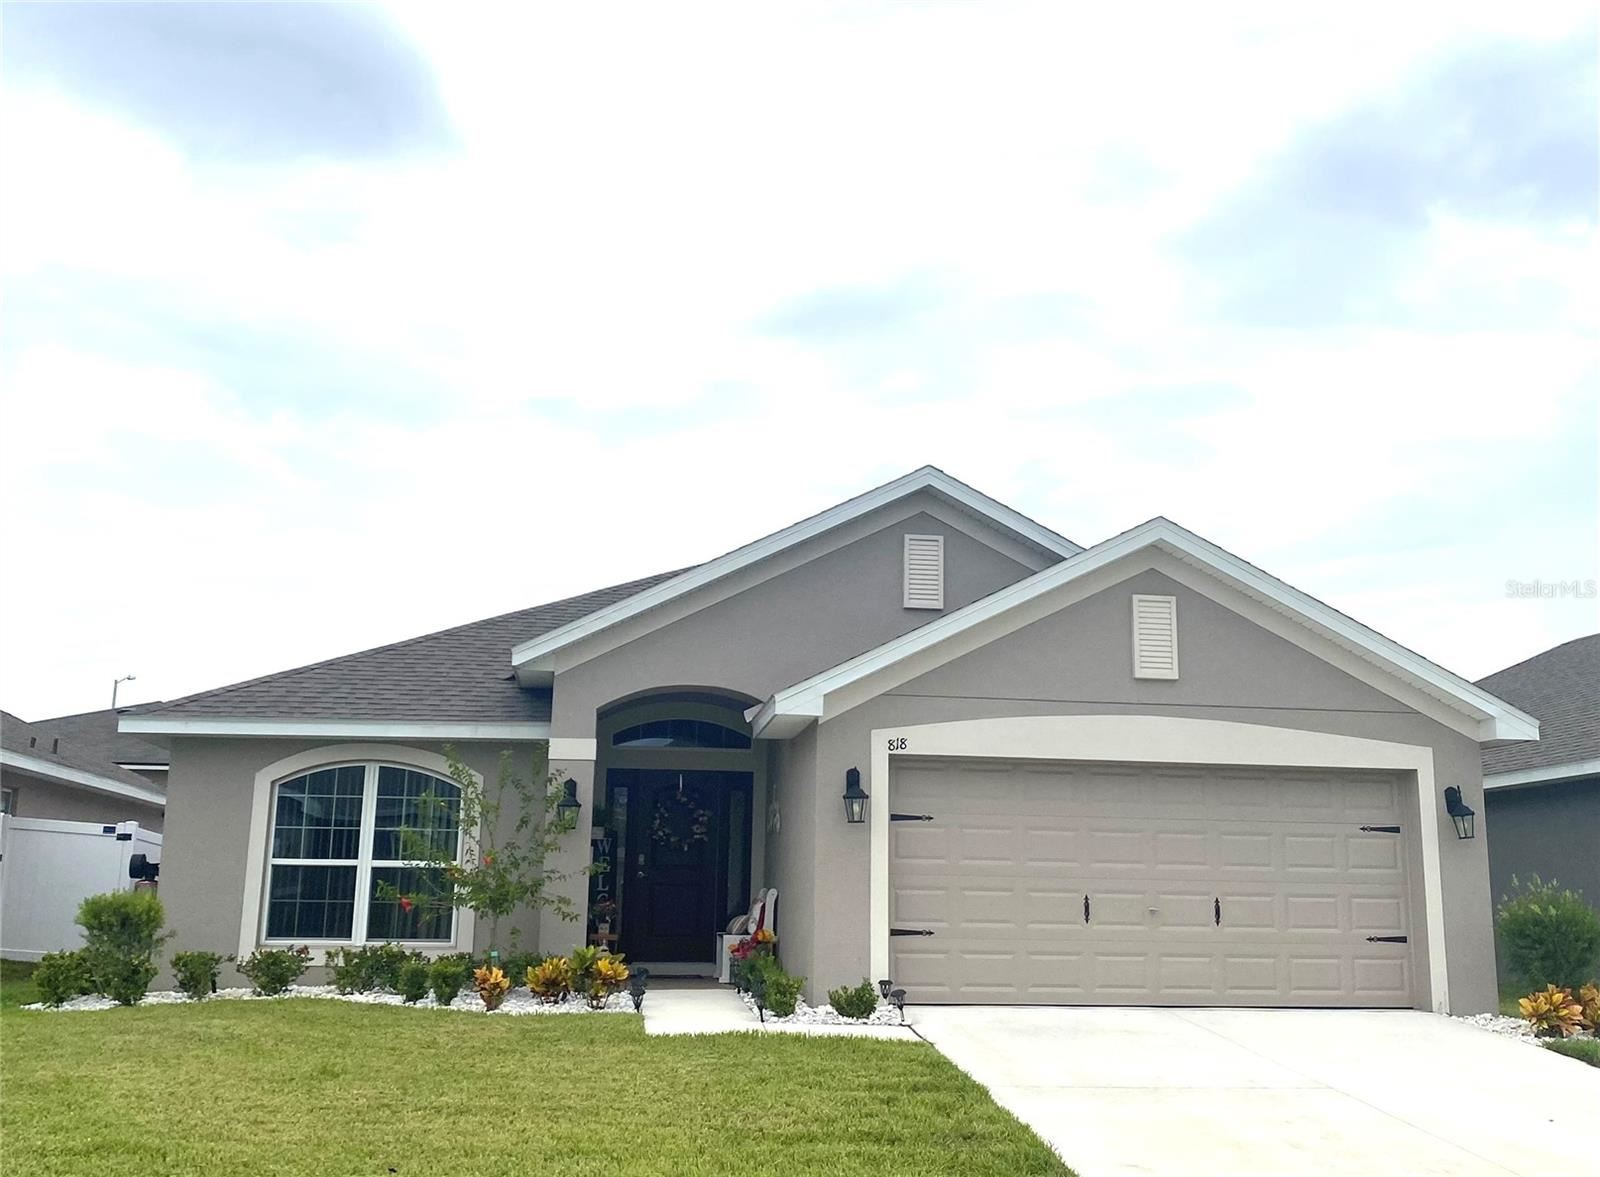 818 LANDMARK HILLS DRIVE, Haines City, FL 33844 - #: T3327526